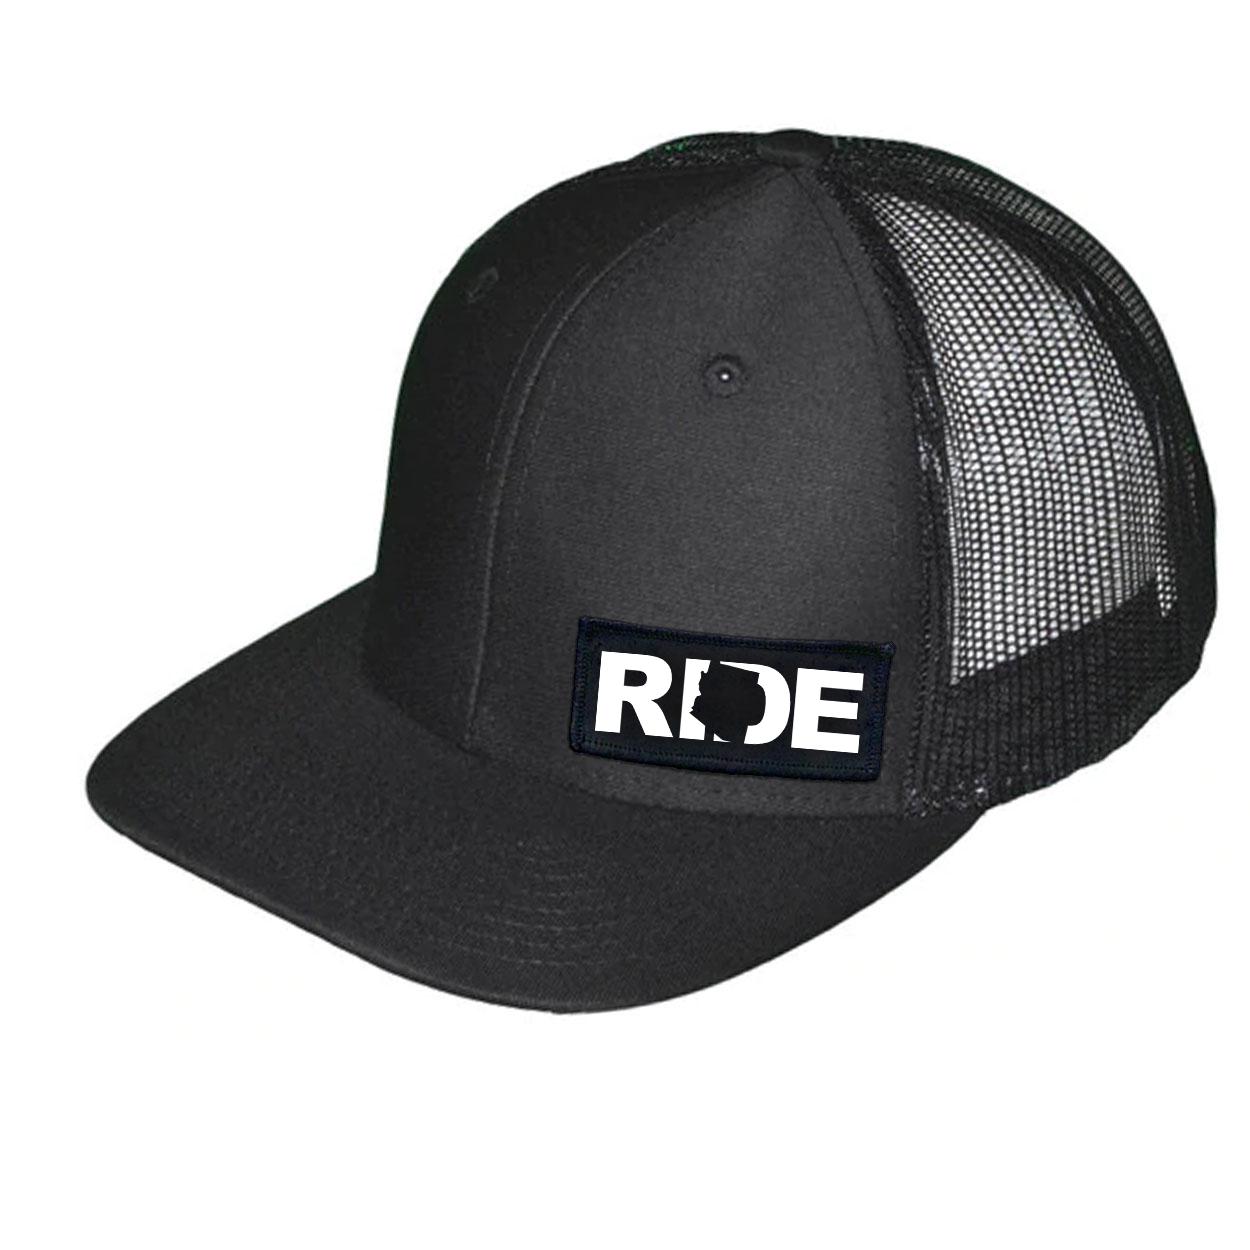 Ride Arizona Night Out Woven Patch Snapback Trucker Hat Black (White Logo)